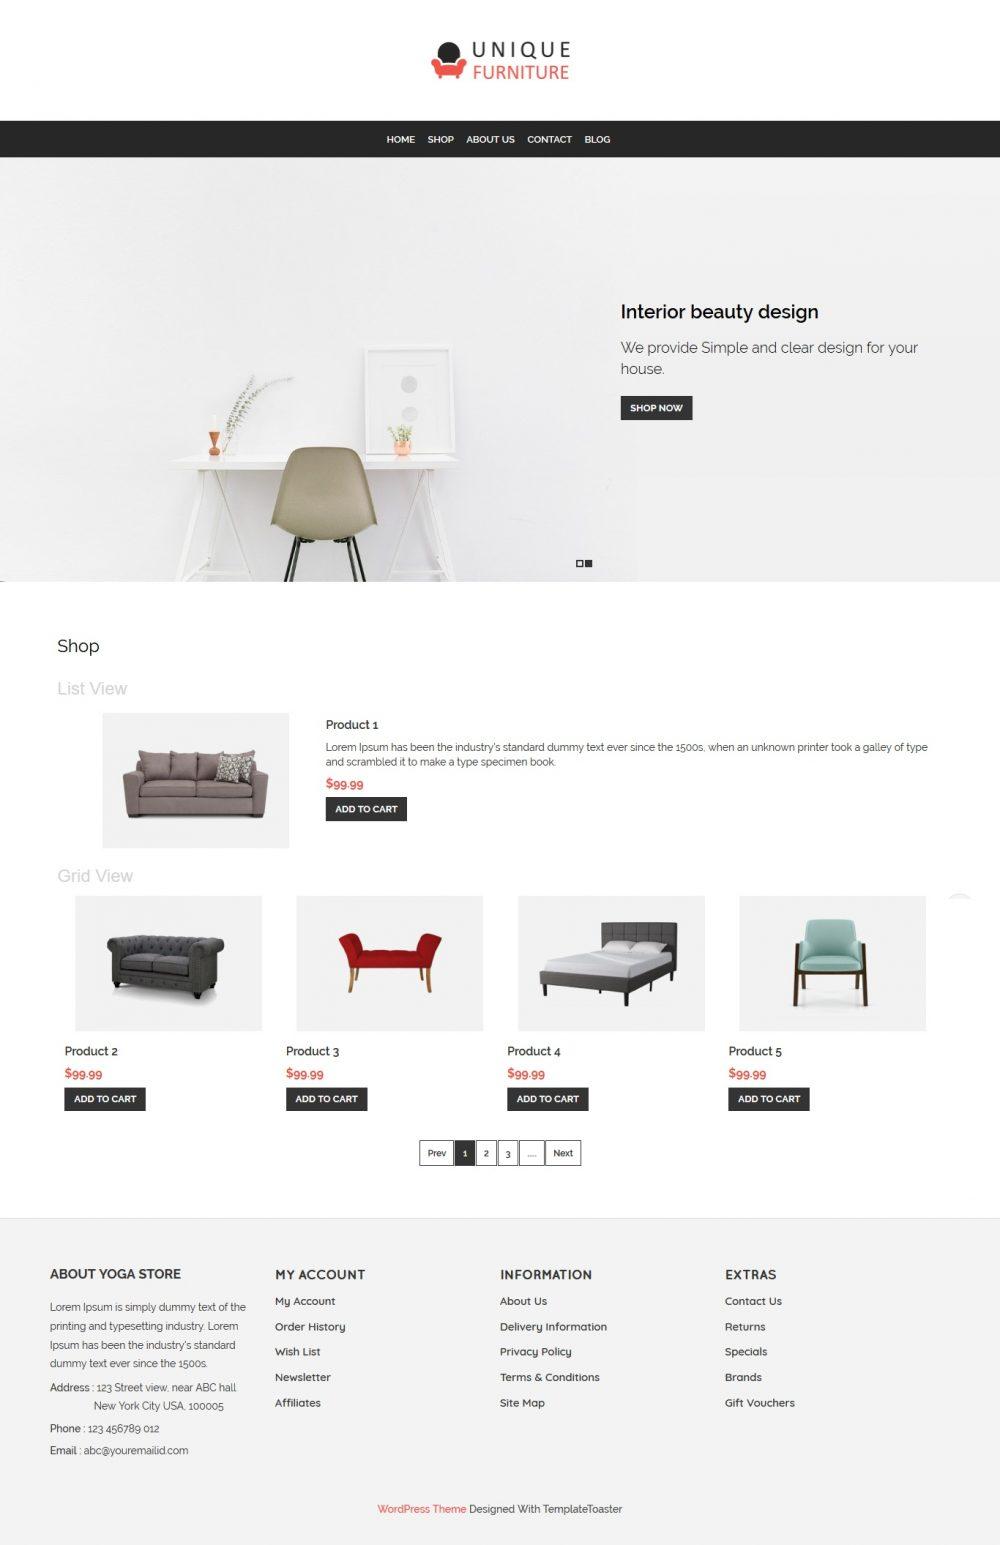 Unique Furniture - Furniture Shop WooCommerce Theme